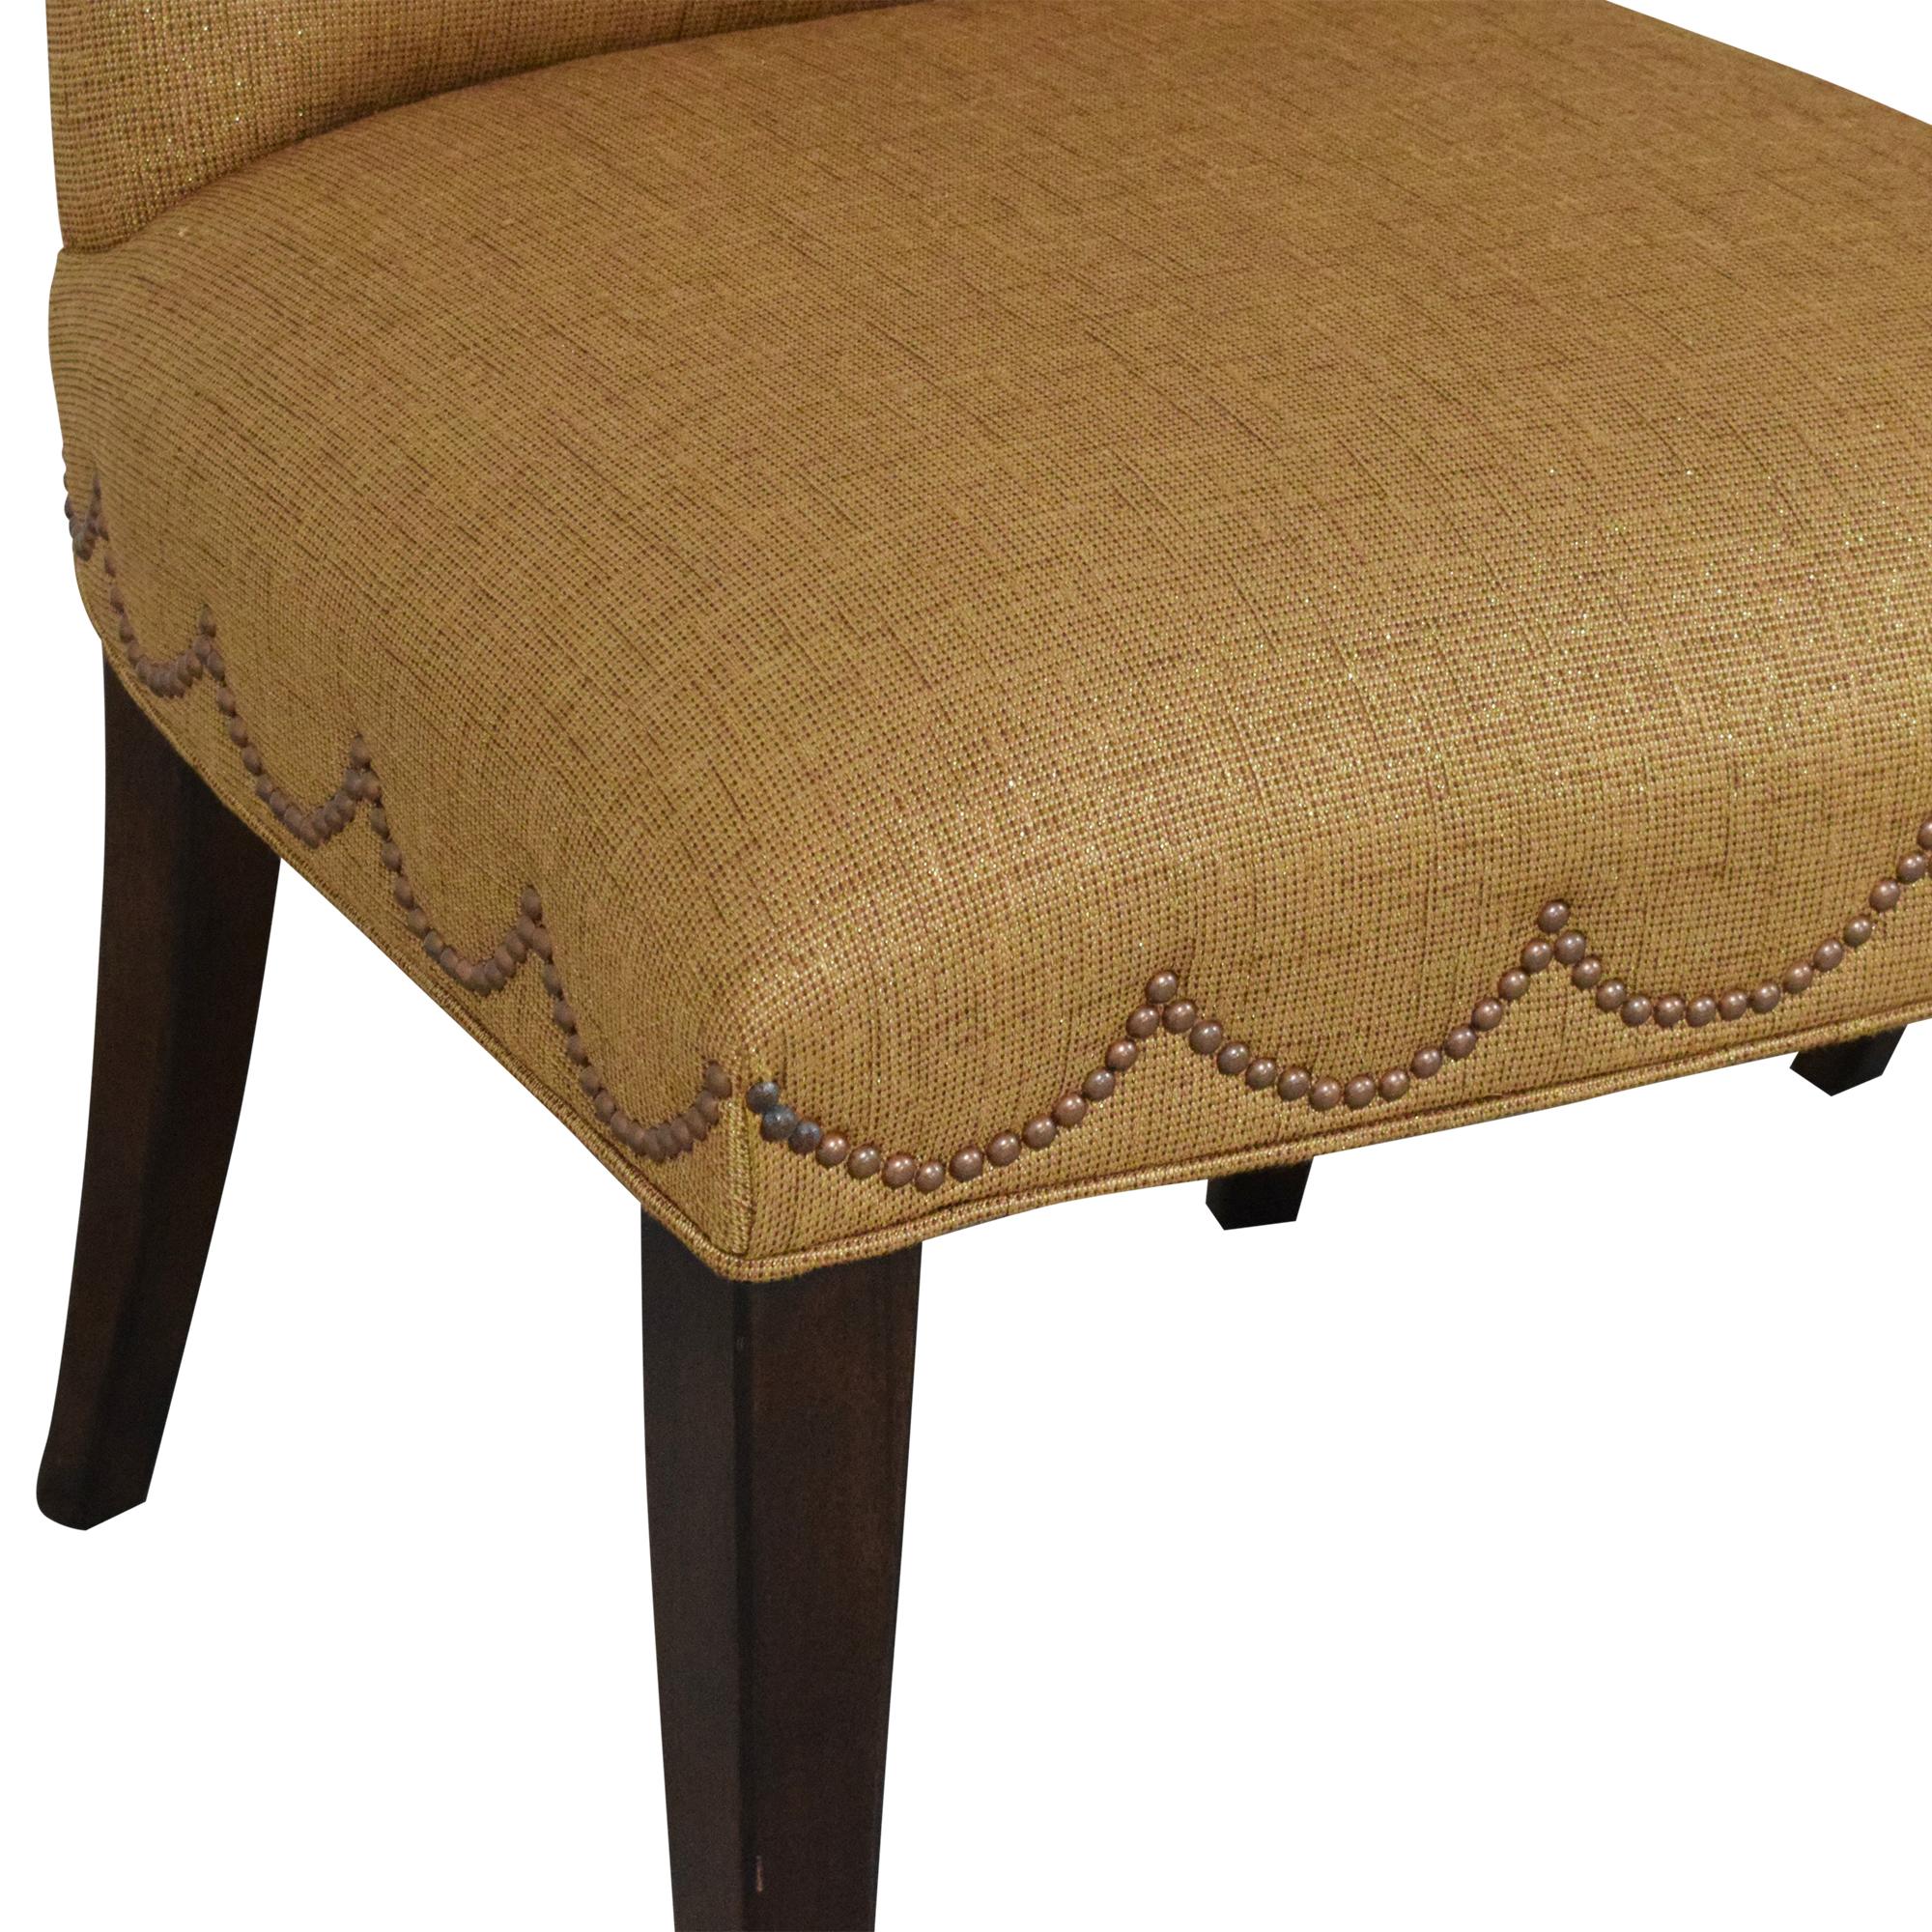 Furniture Brands International Furniture Brands International Scalloped Nailhead Dining Chairs nyc